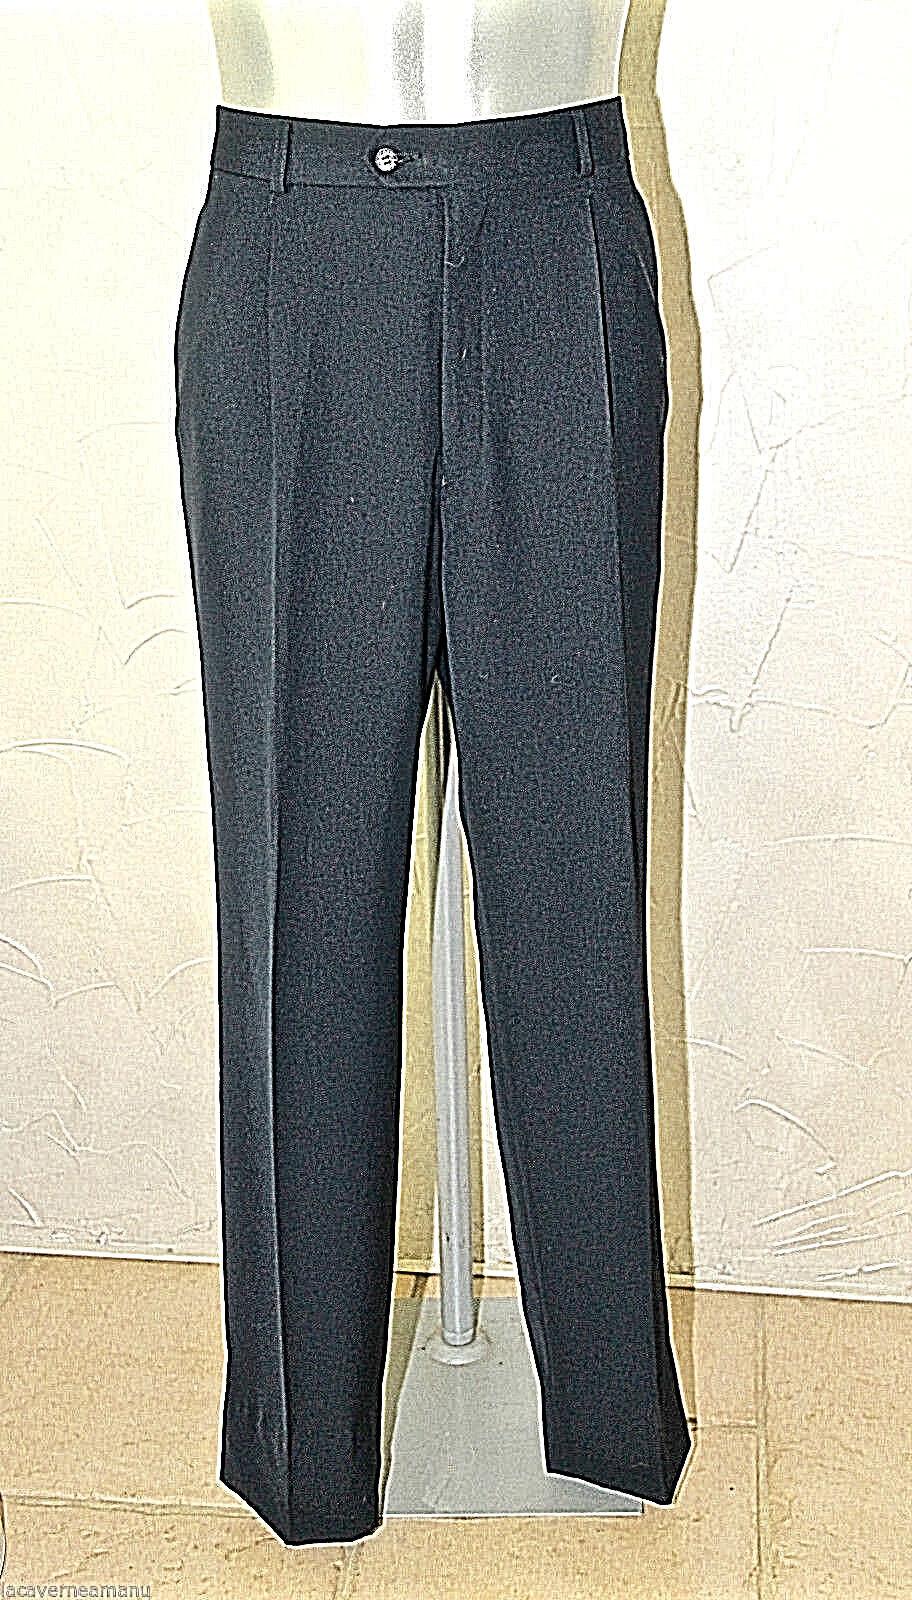 Pantalones pinza marina bcbg muy elegante LACOSTE talla 46 (I 54) COMO NUEVO